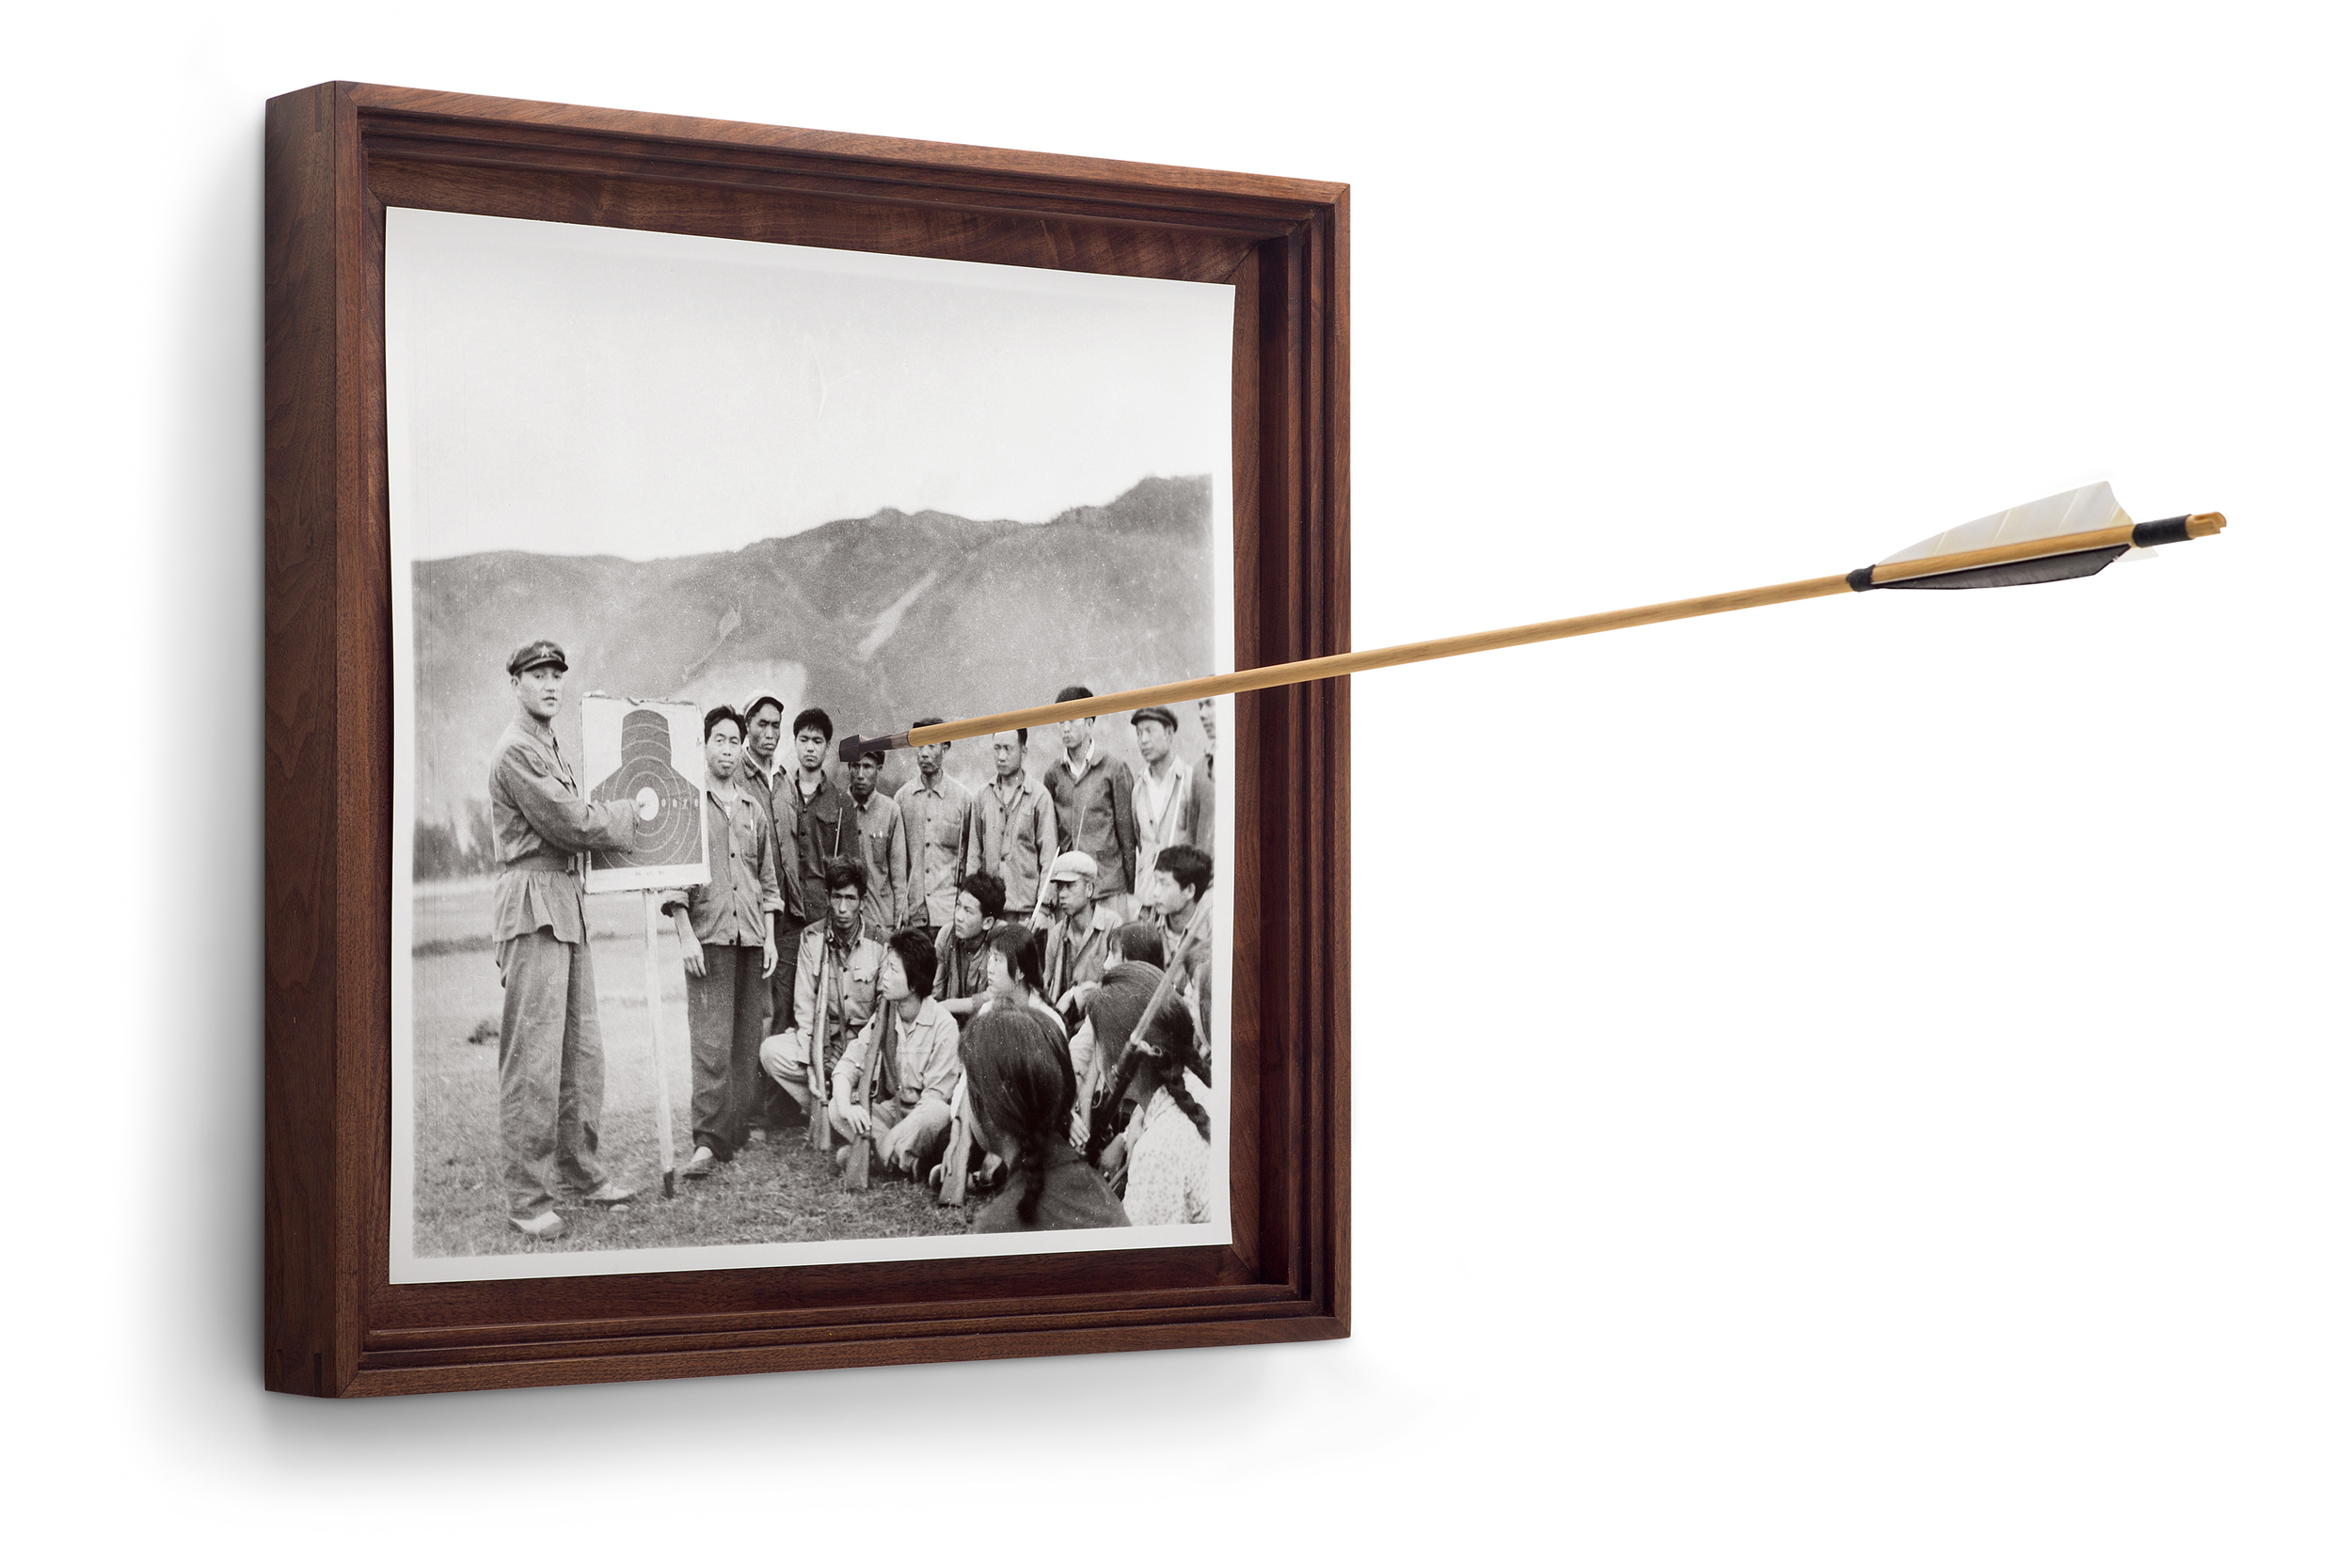 Cai_Dongdong_Off_the_Target_silver_gelatin_print_arrow_54x54x80cm_2015